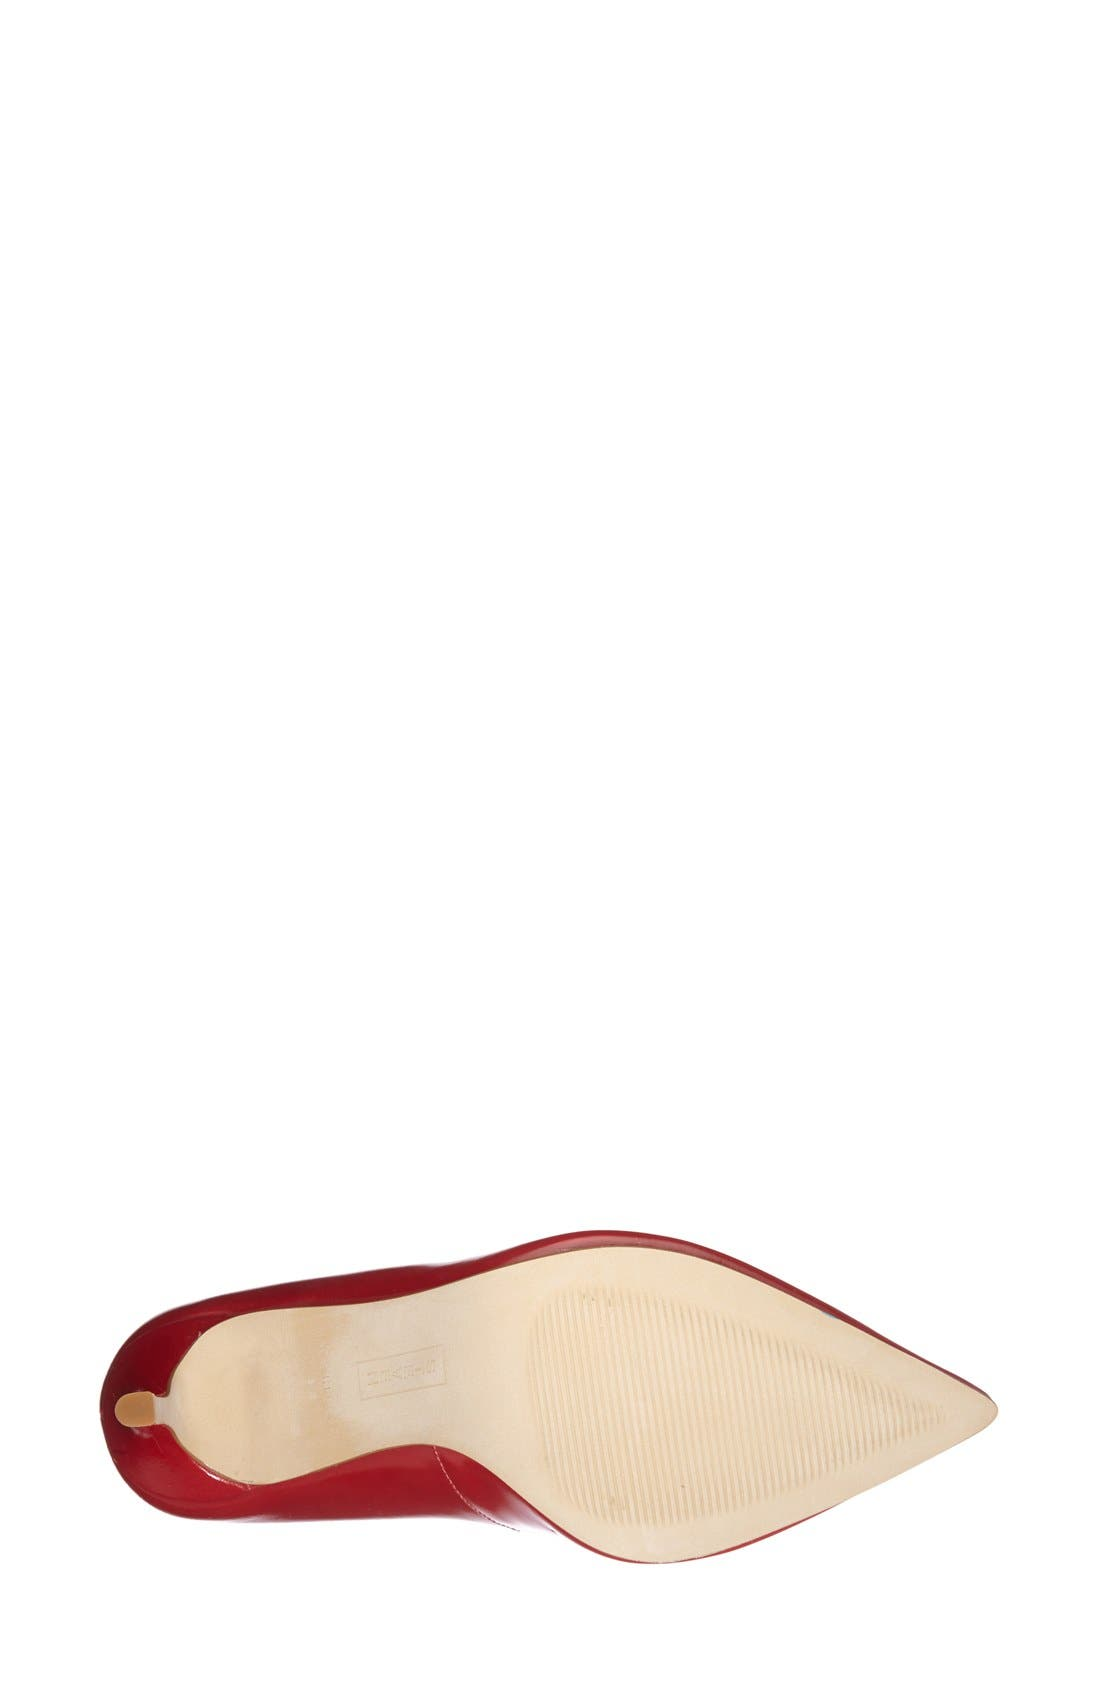 Alternate Image 4  - Steven by Steve Madden 'Shiela' Pointy Toe Pump (Women)